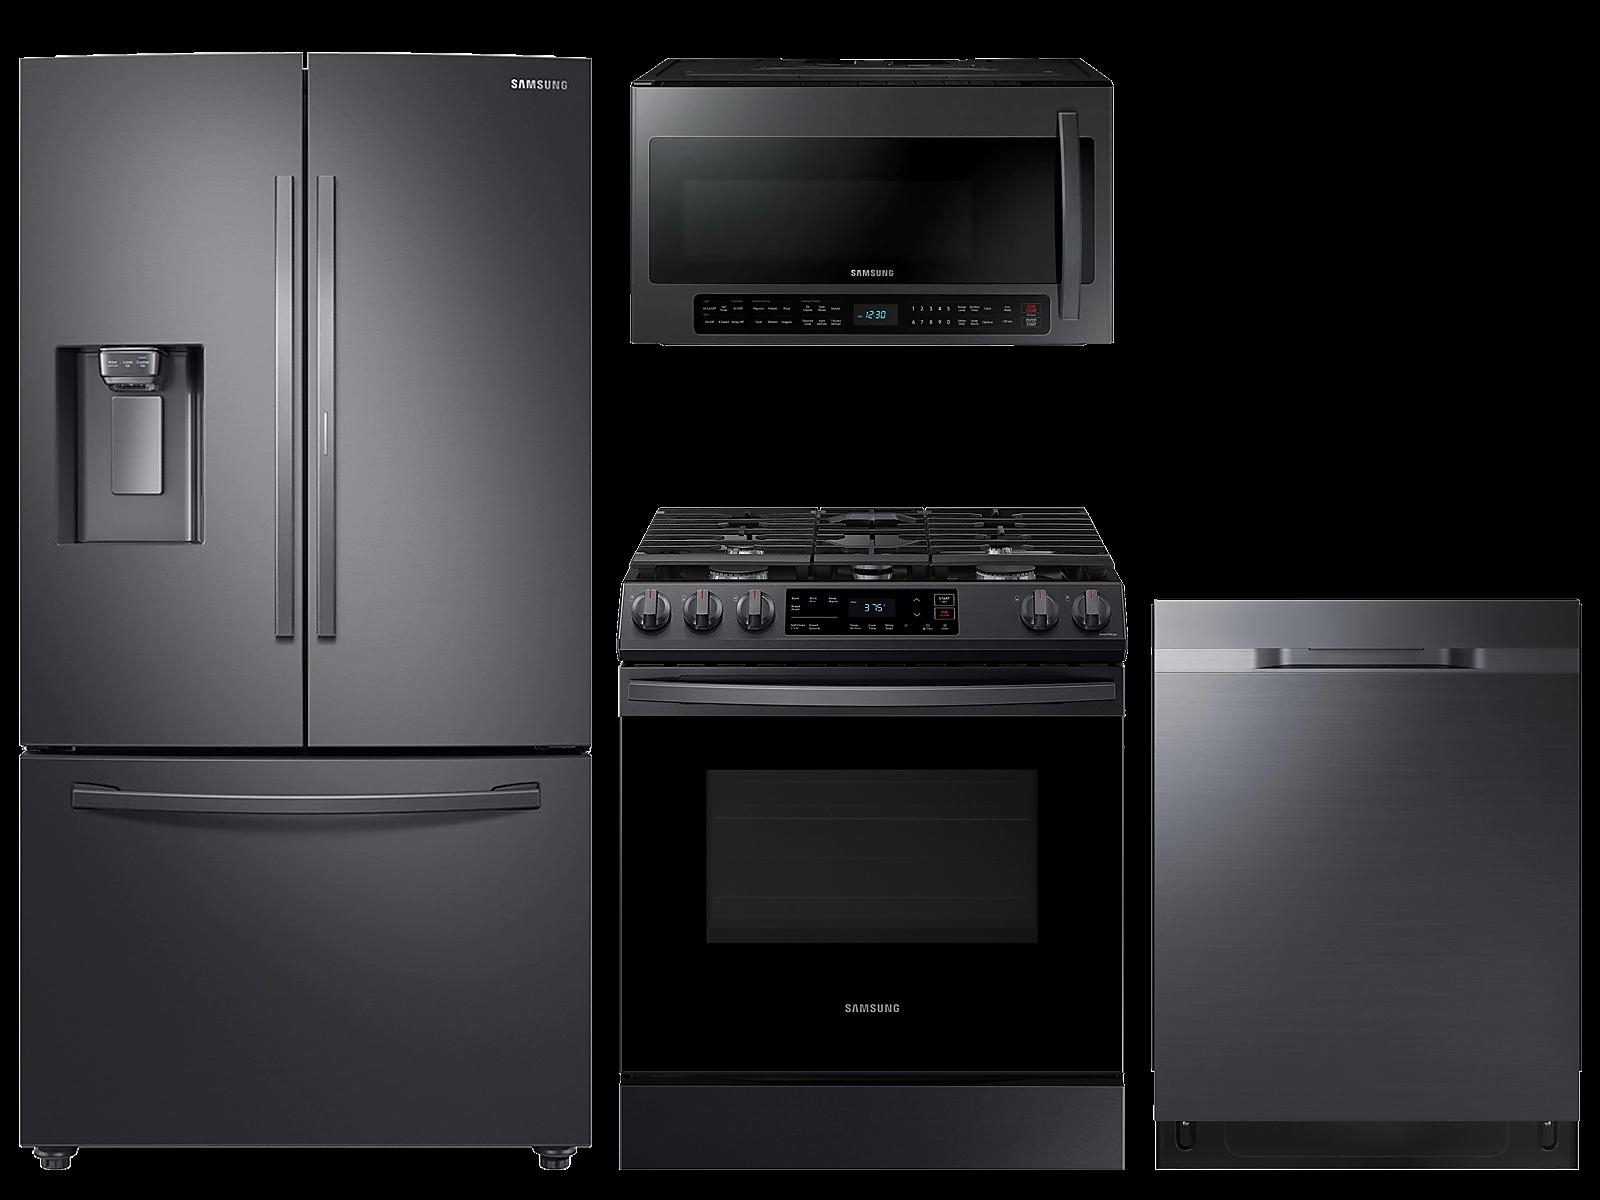 Samsung coupon: Samsung 28 cu. ft. full depth 3-door refrigerator, gas range, 2.1 cu. ft. microwave and 48 dBA dishwasher package(BNDL-1614626558667)